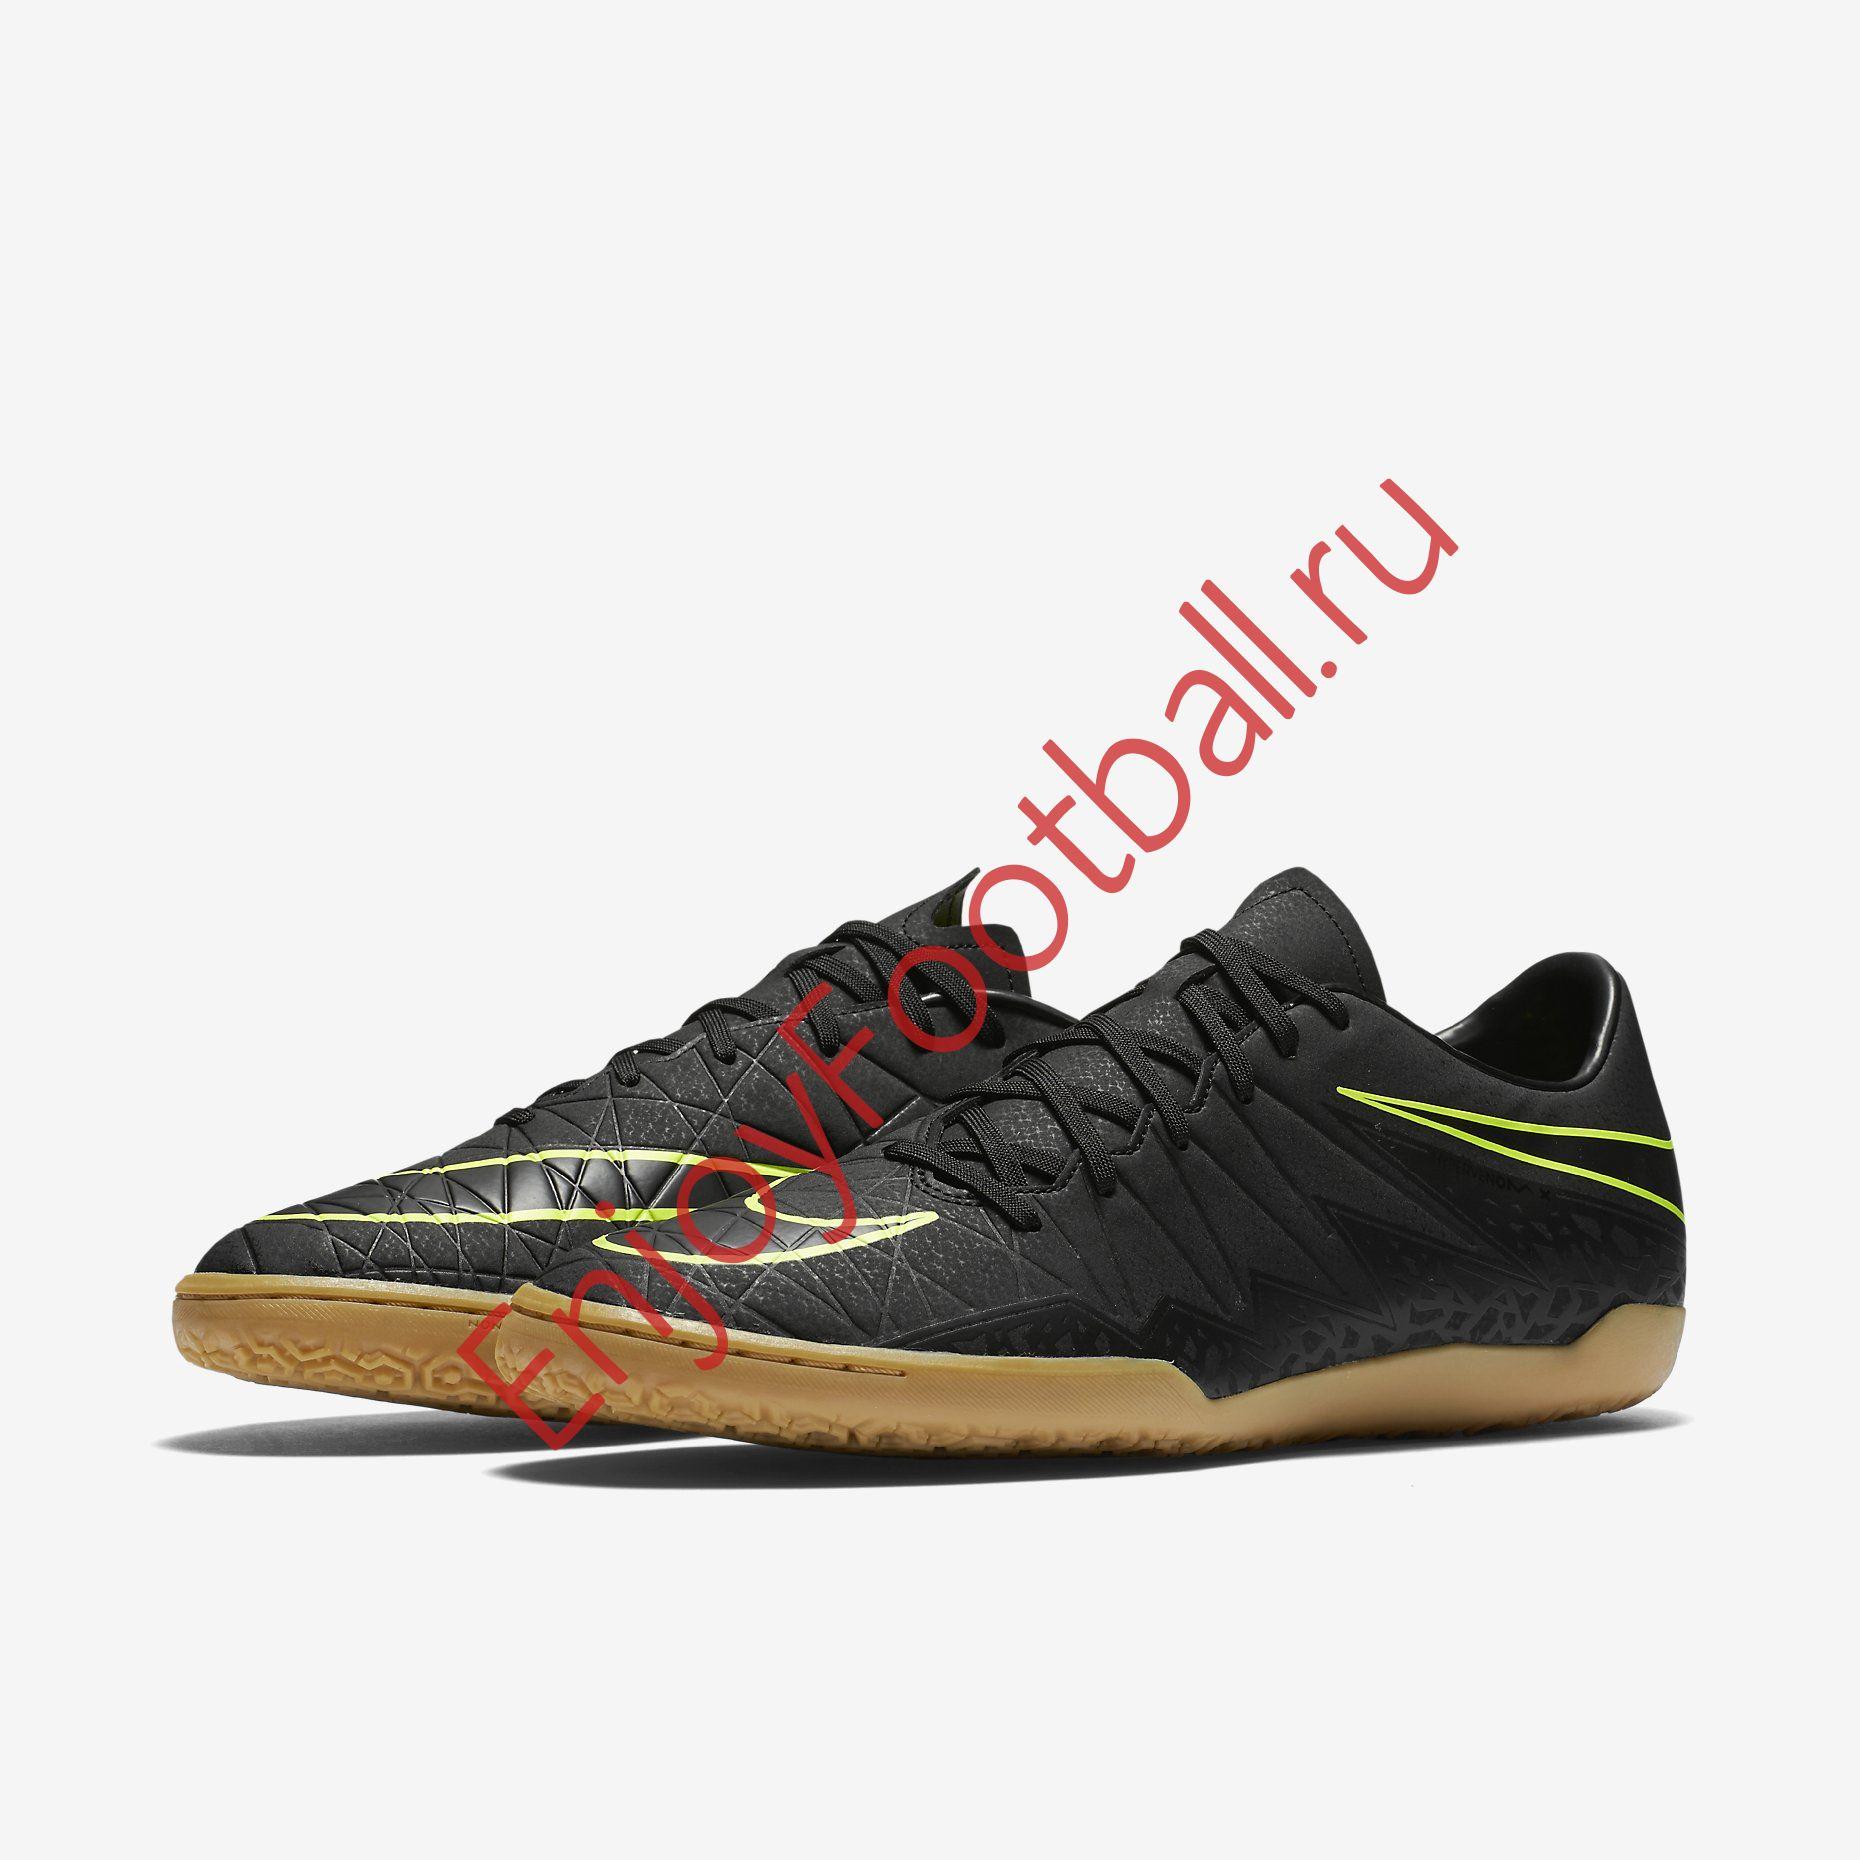 133b8ecbb Игровая обувь для зала NIKE HYPERVENOM PHELON II IC 749898-009 ...